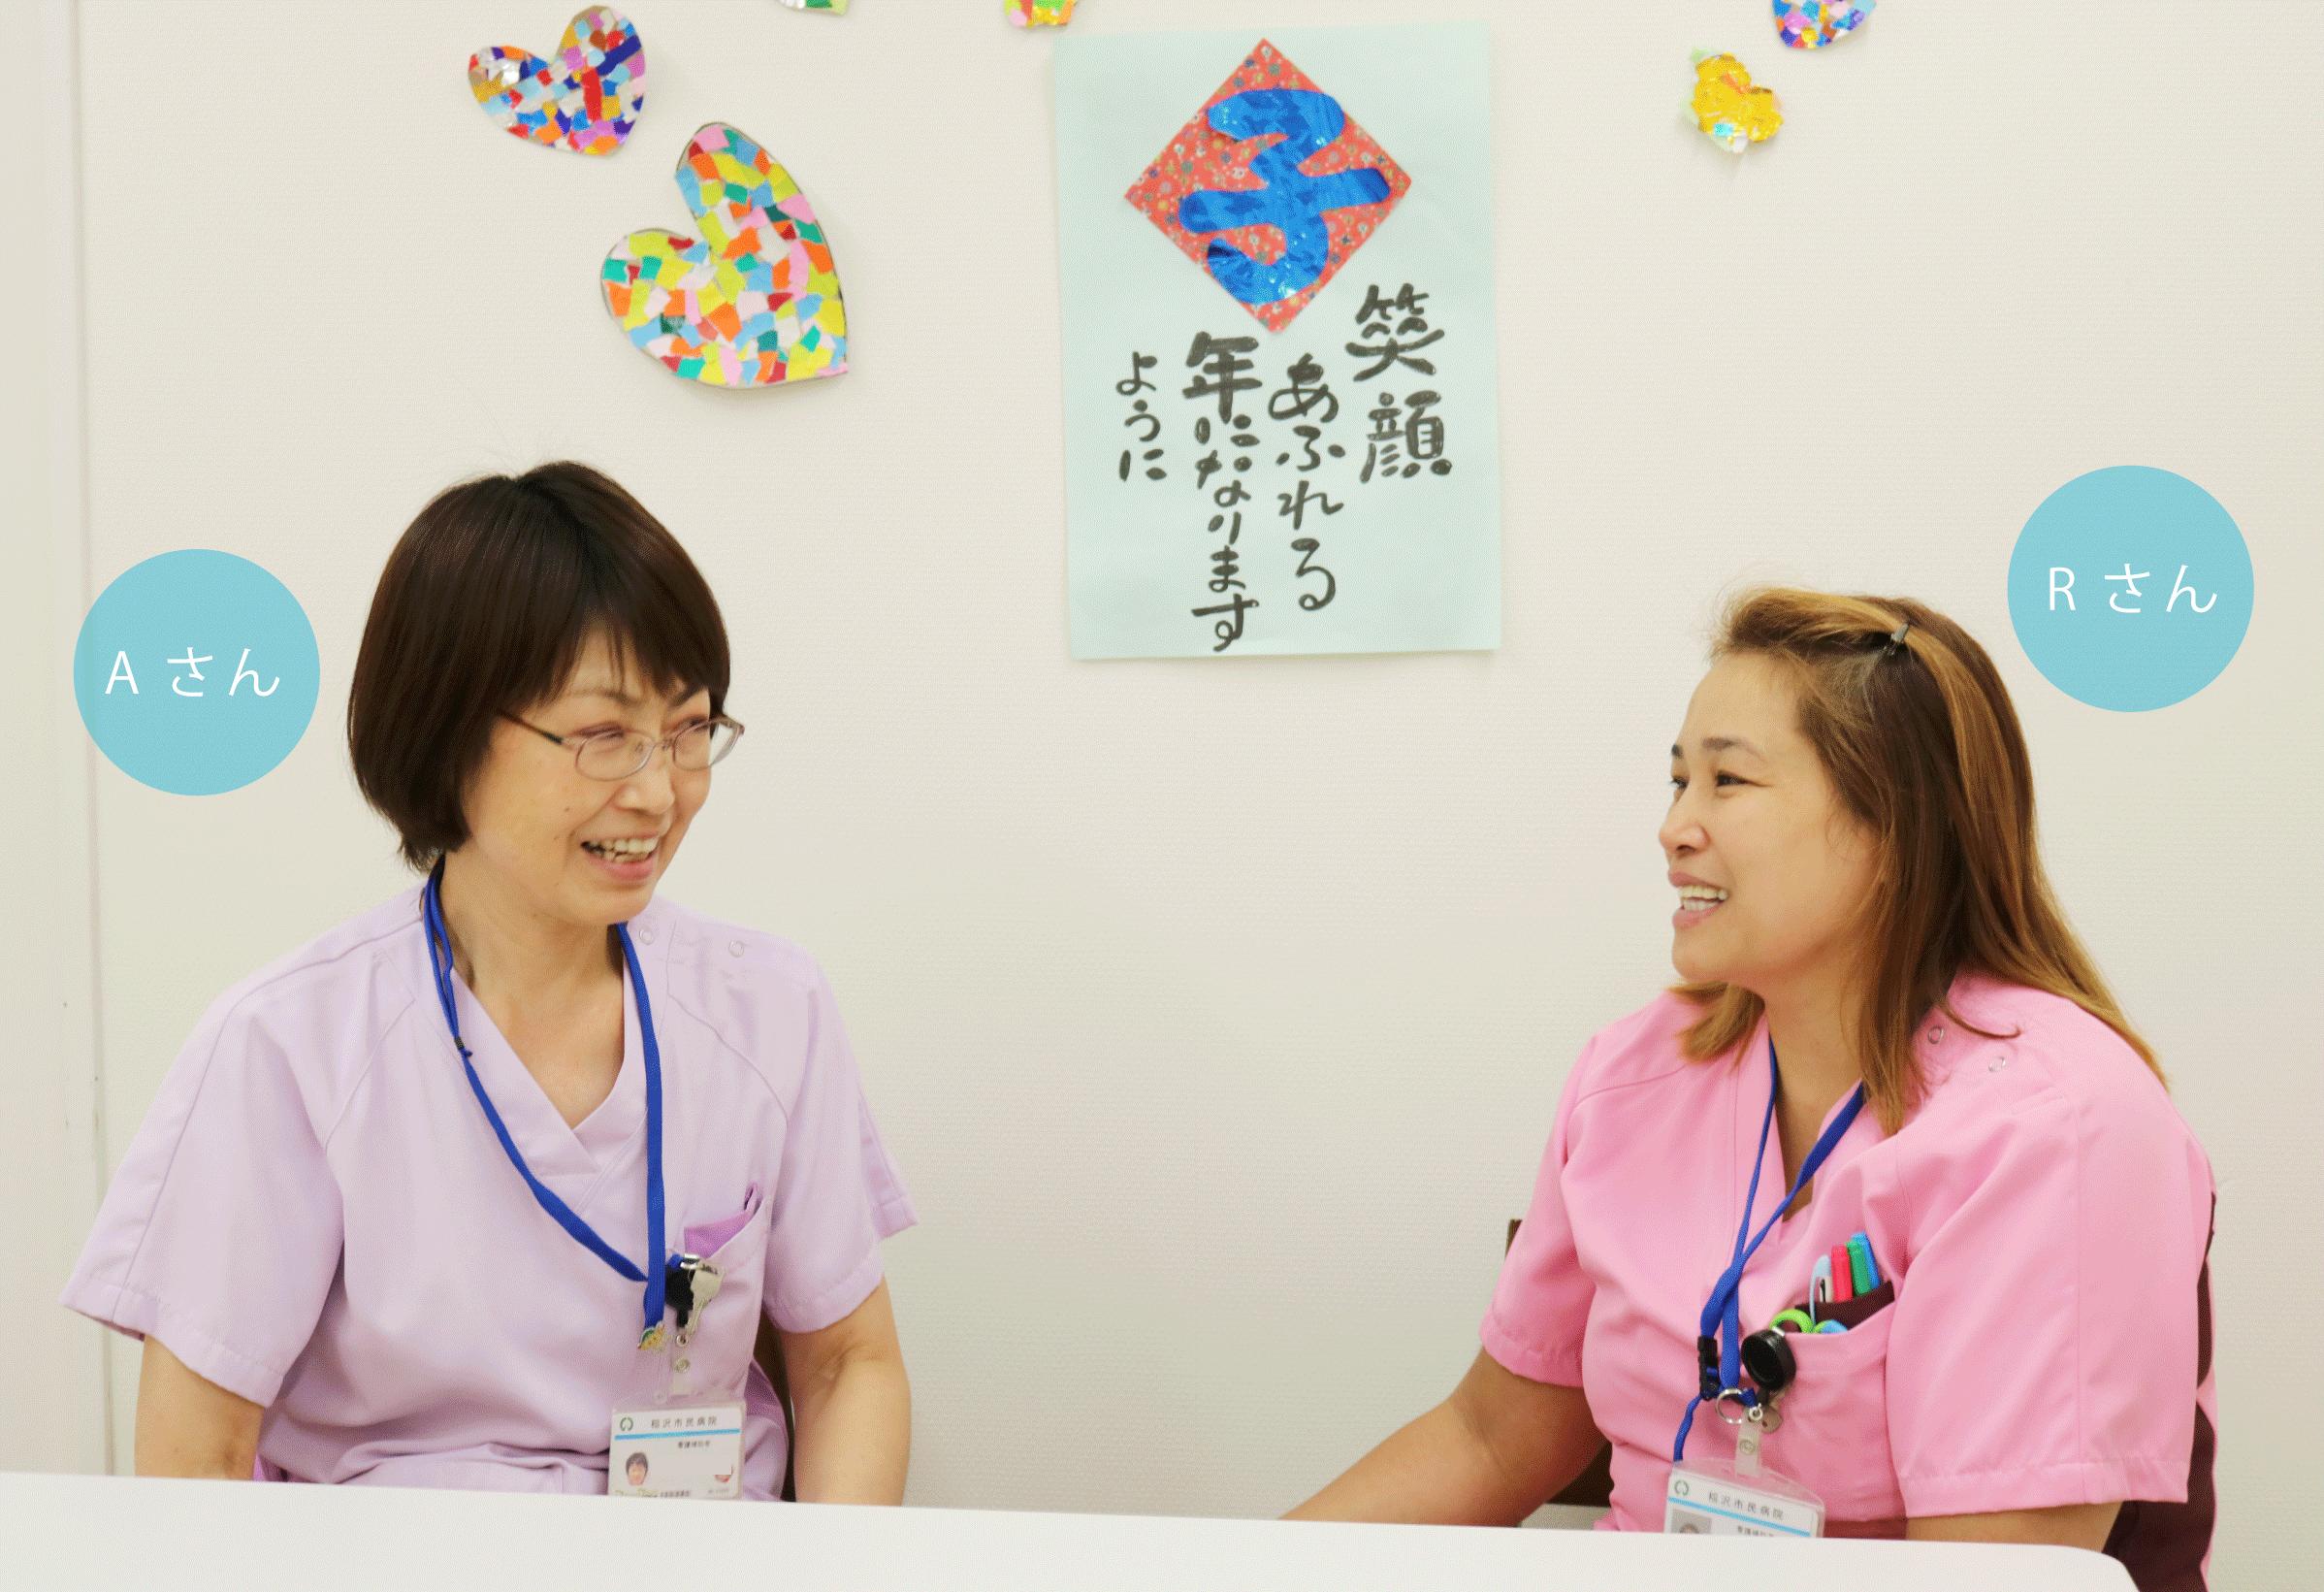 看護補助者の写真